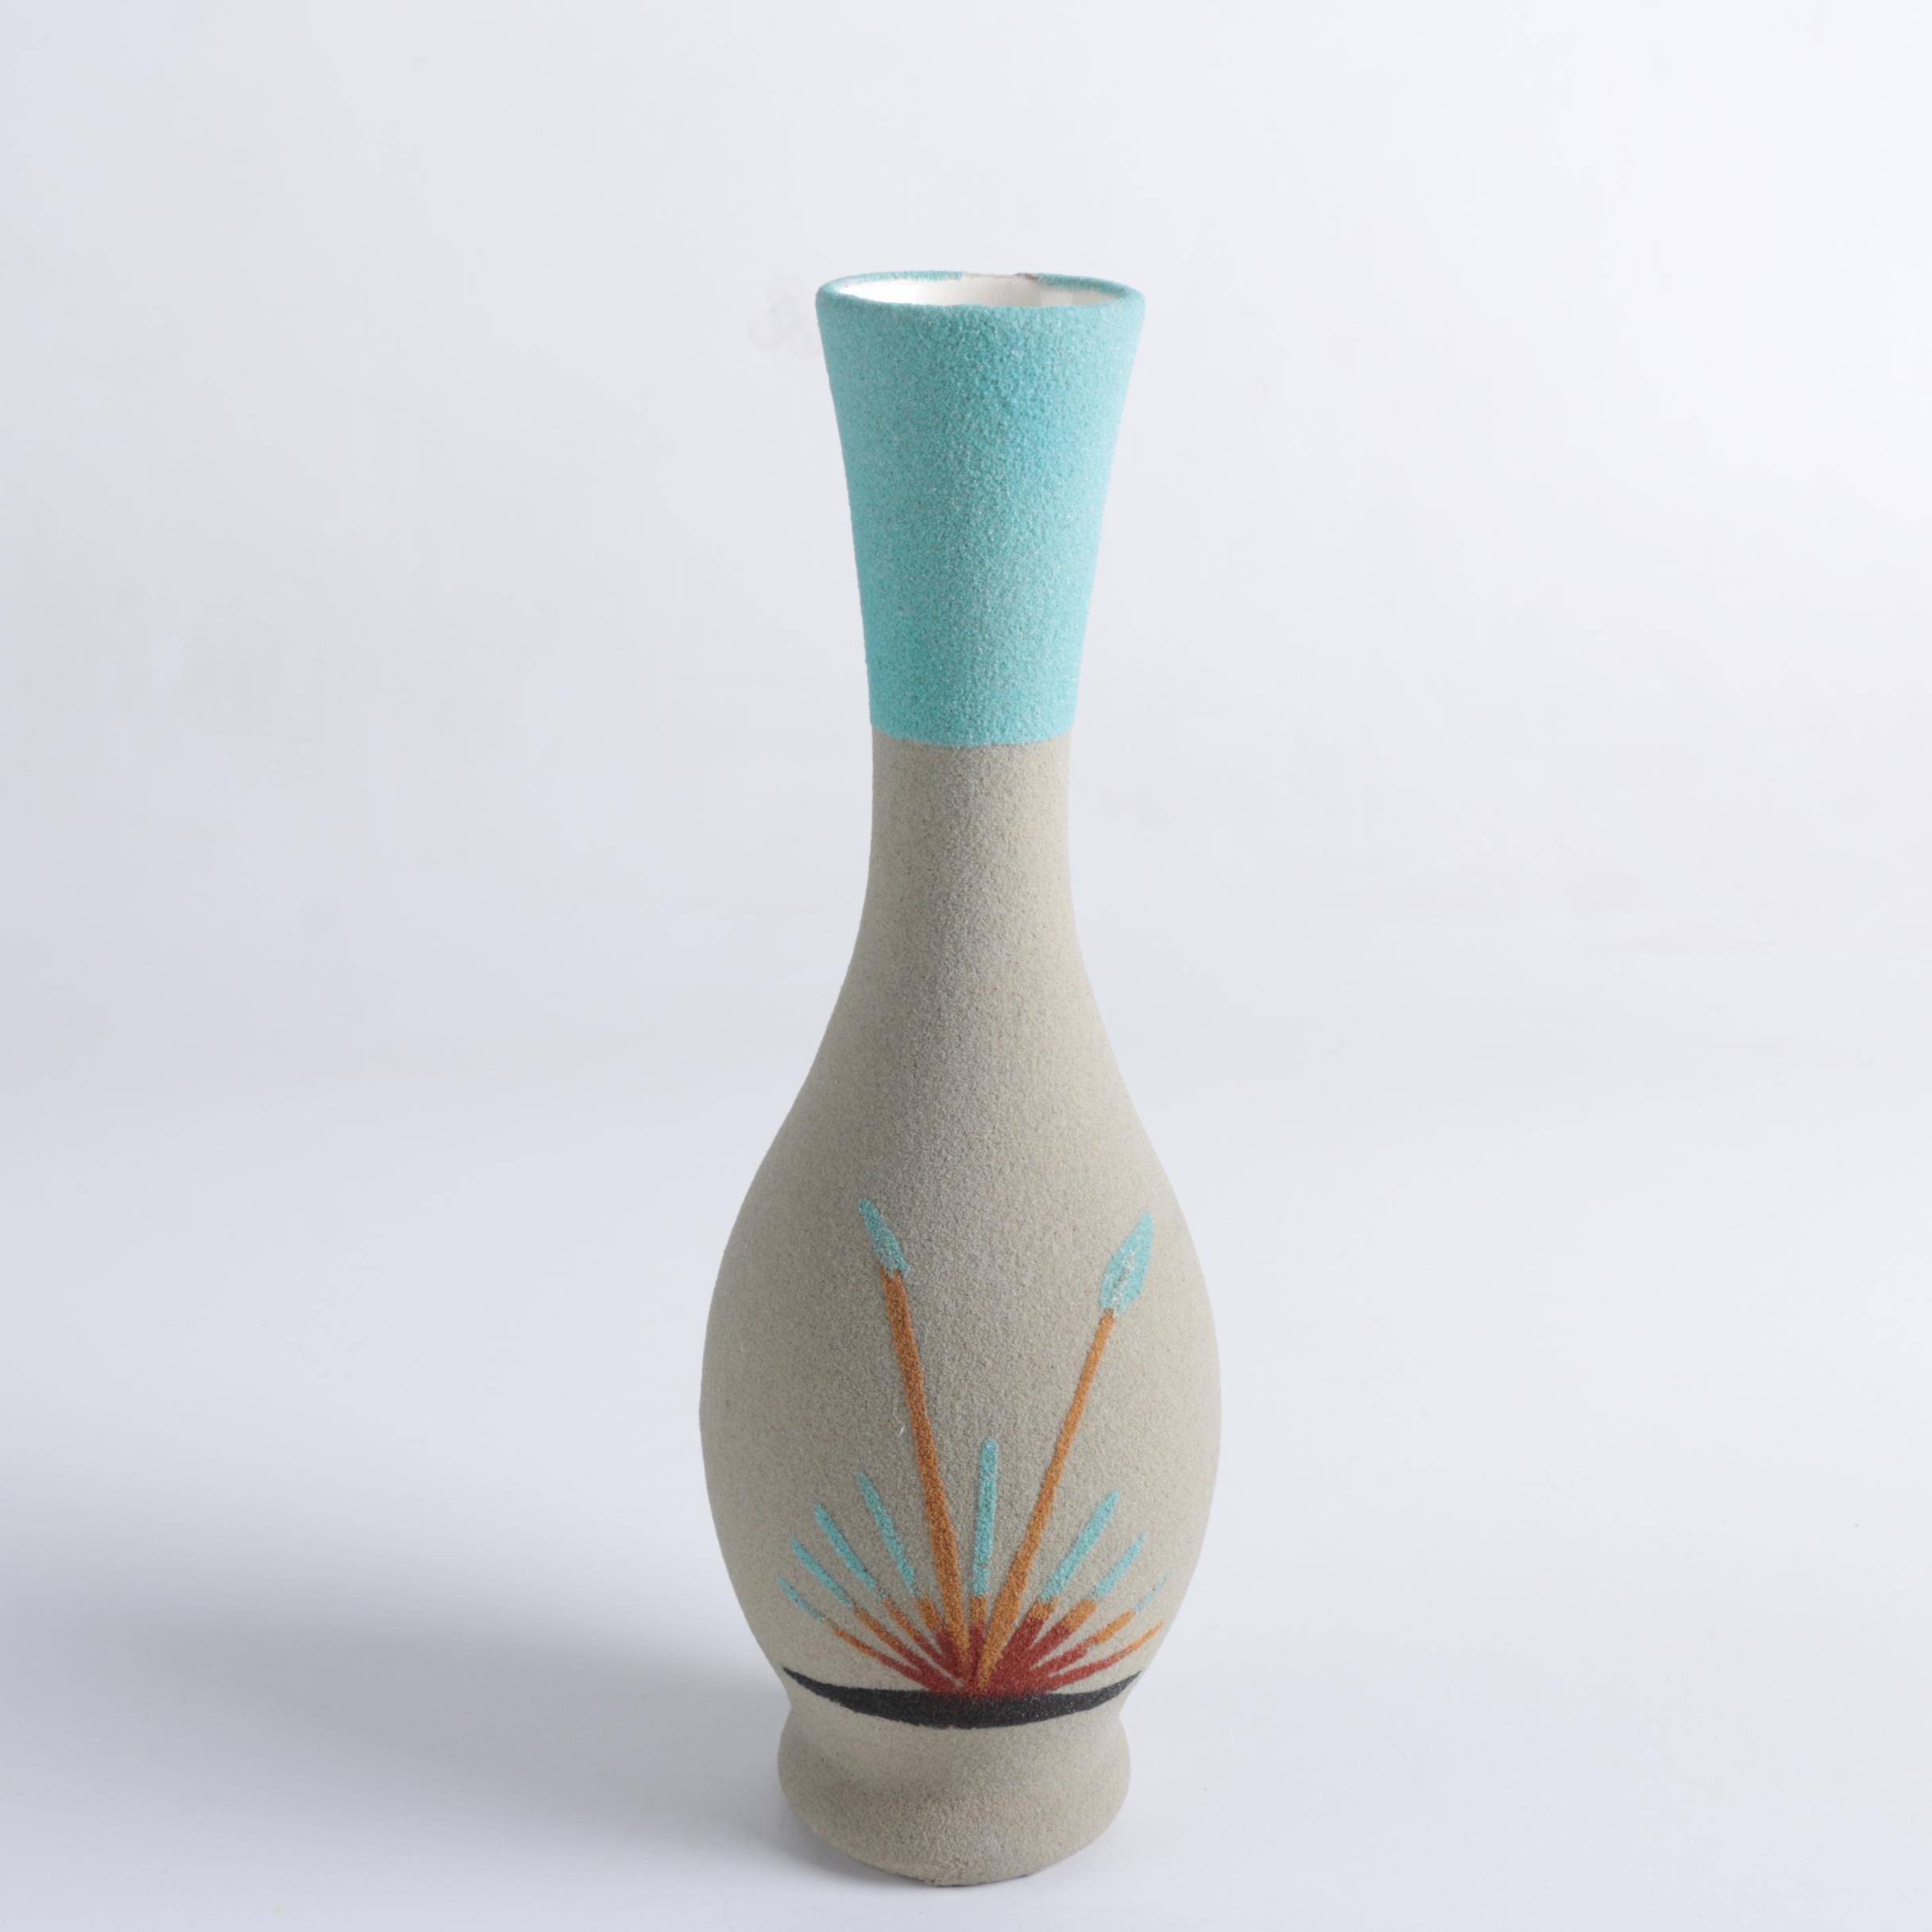 Ceramic Vase with Sand Decoration